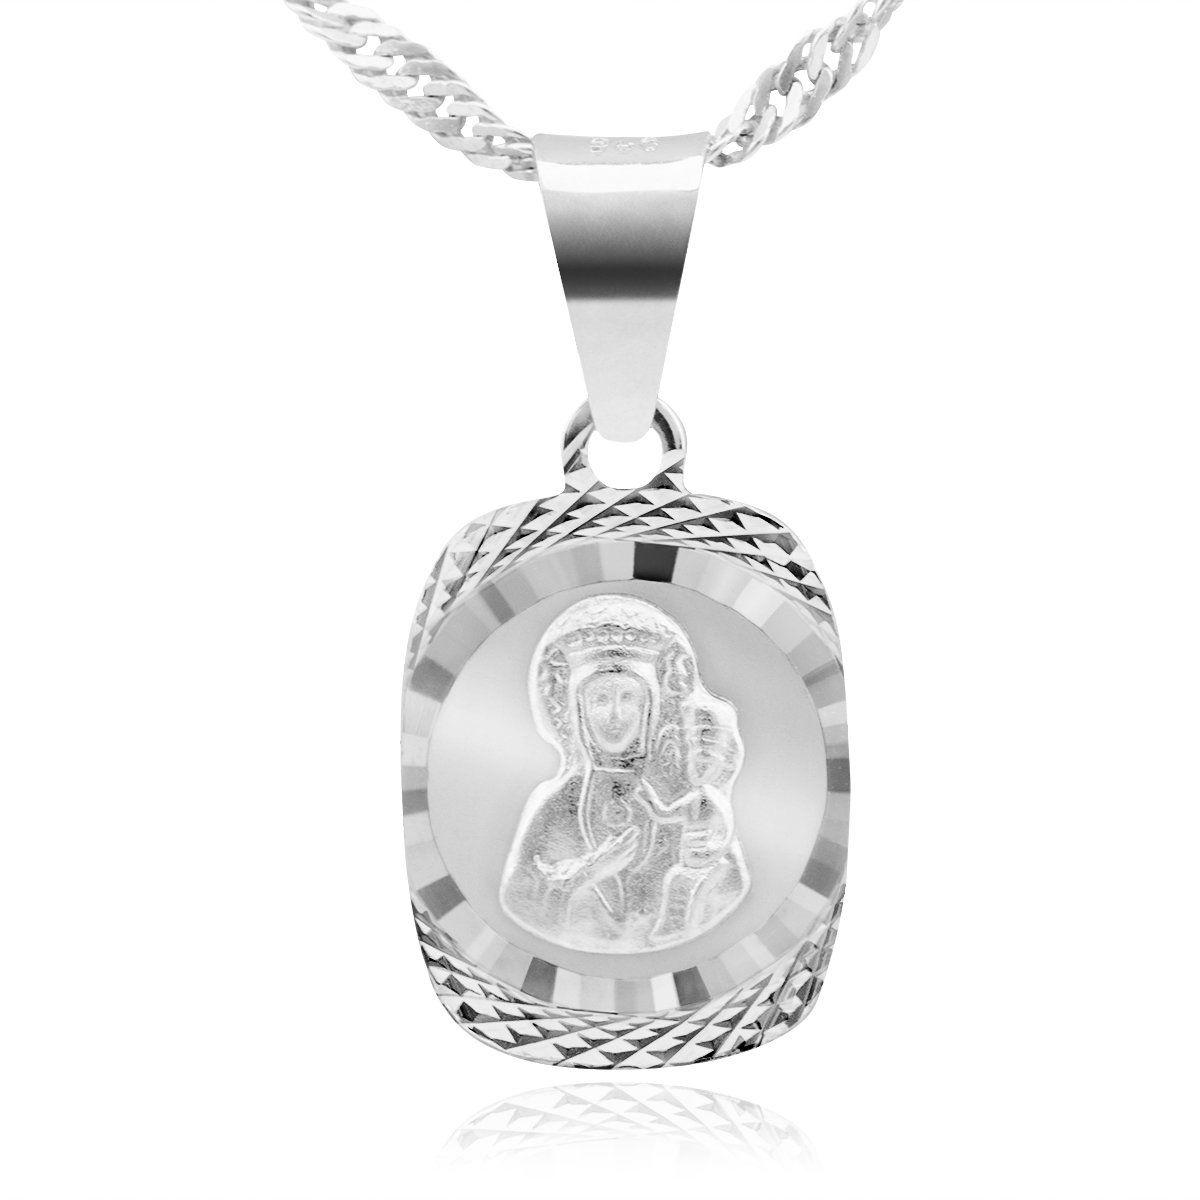 Srebrny medalik Matka Boska Częstochowska pr. 925